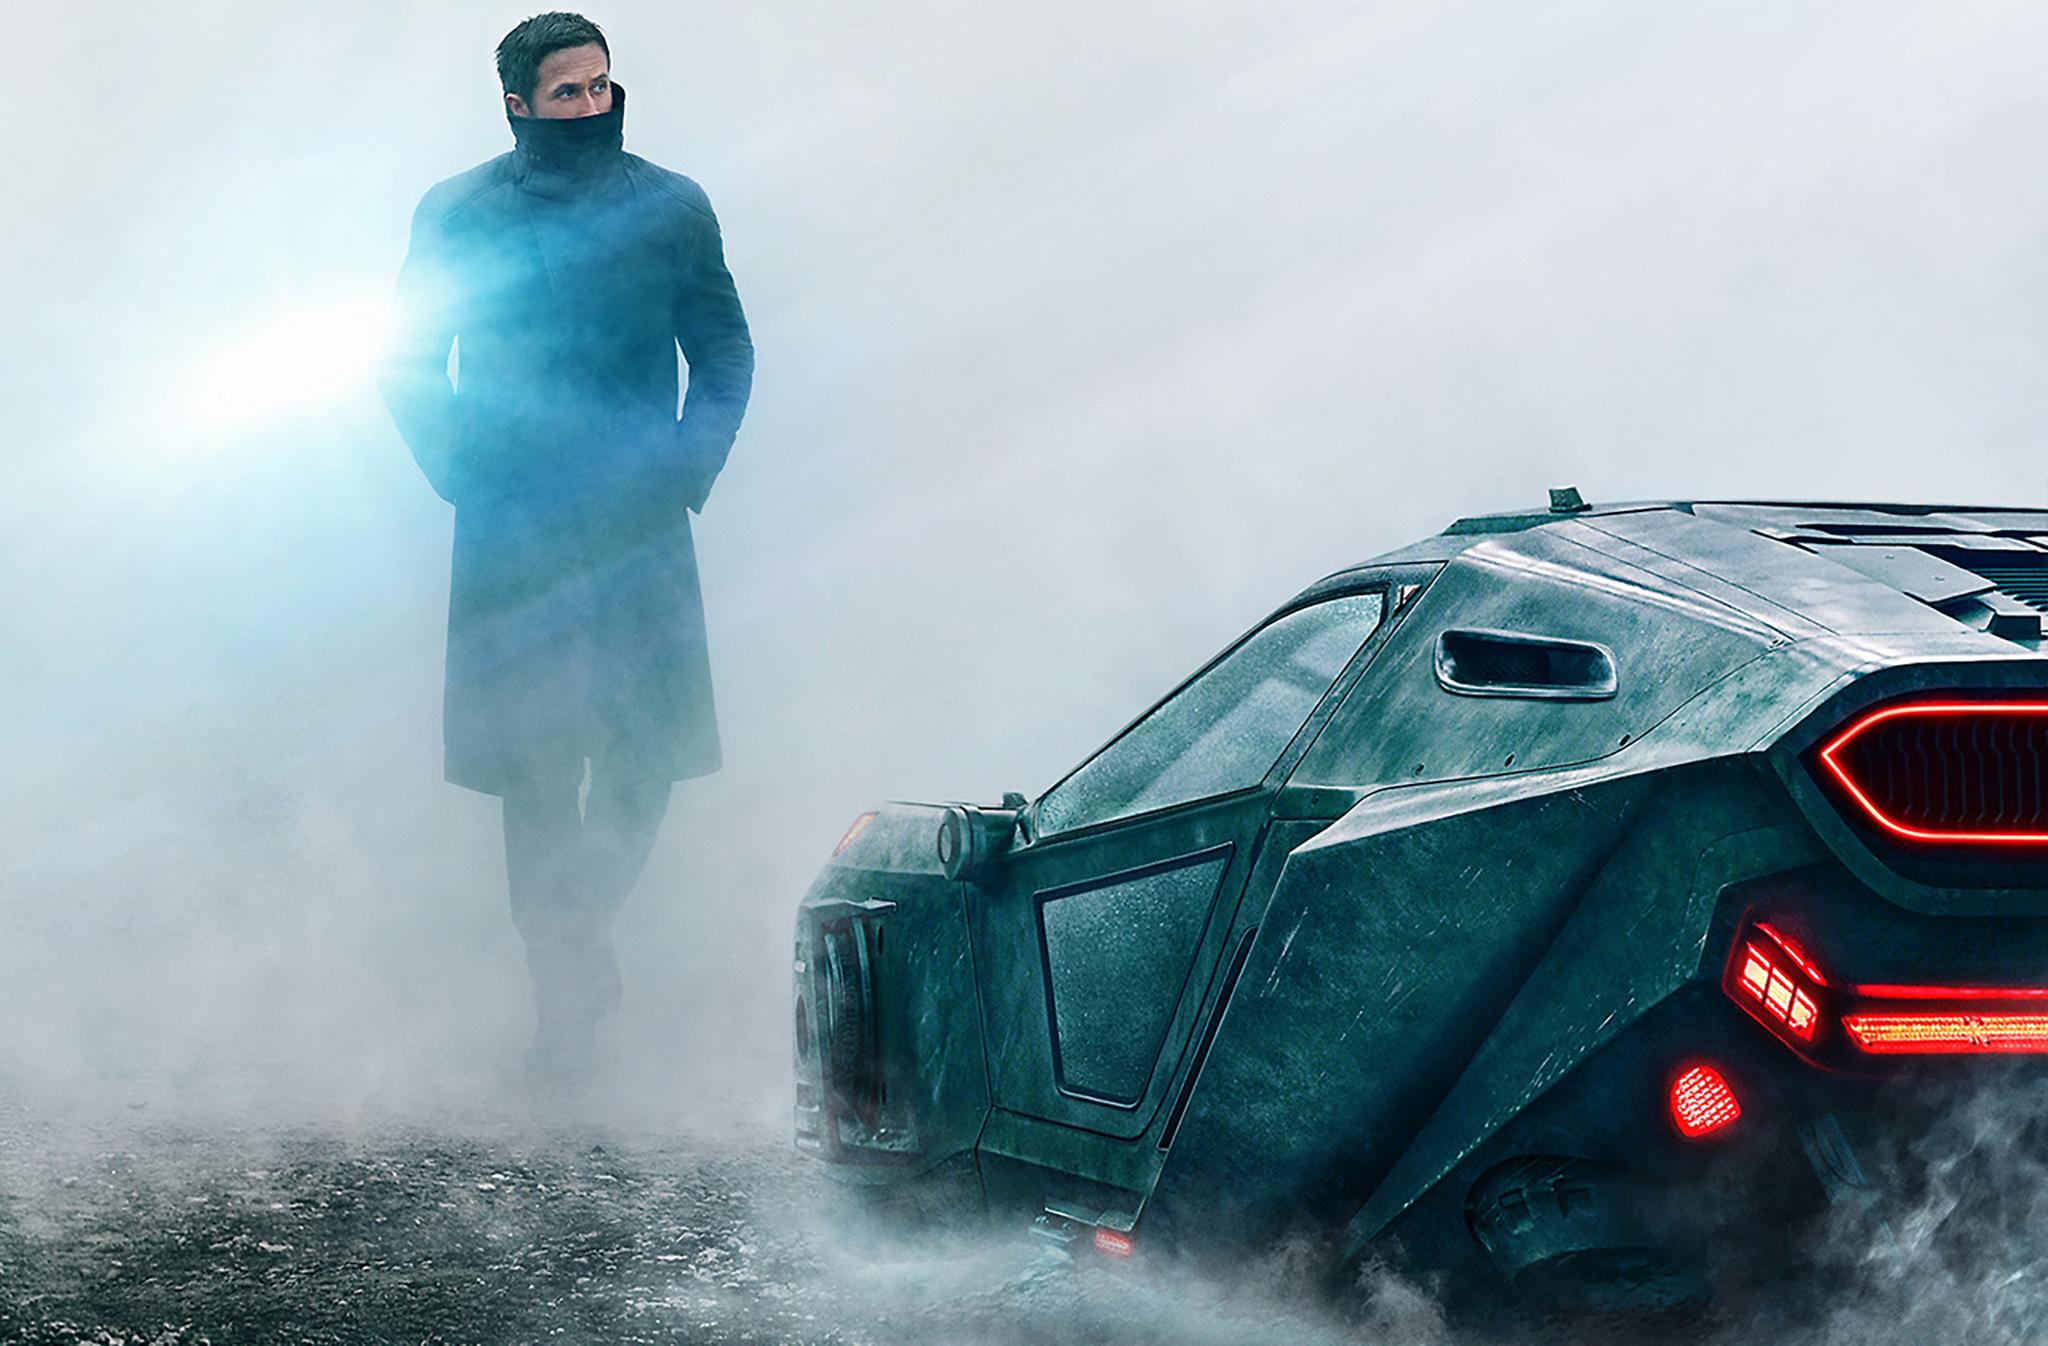 Resultado de imagen para Blade Runner 2049